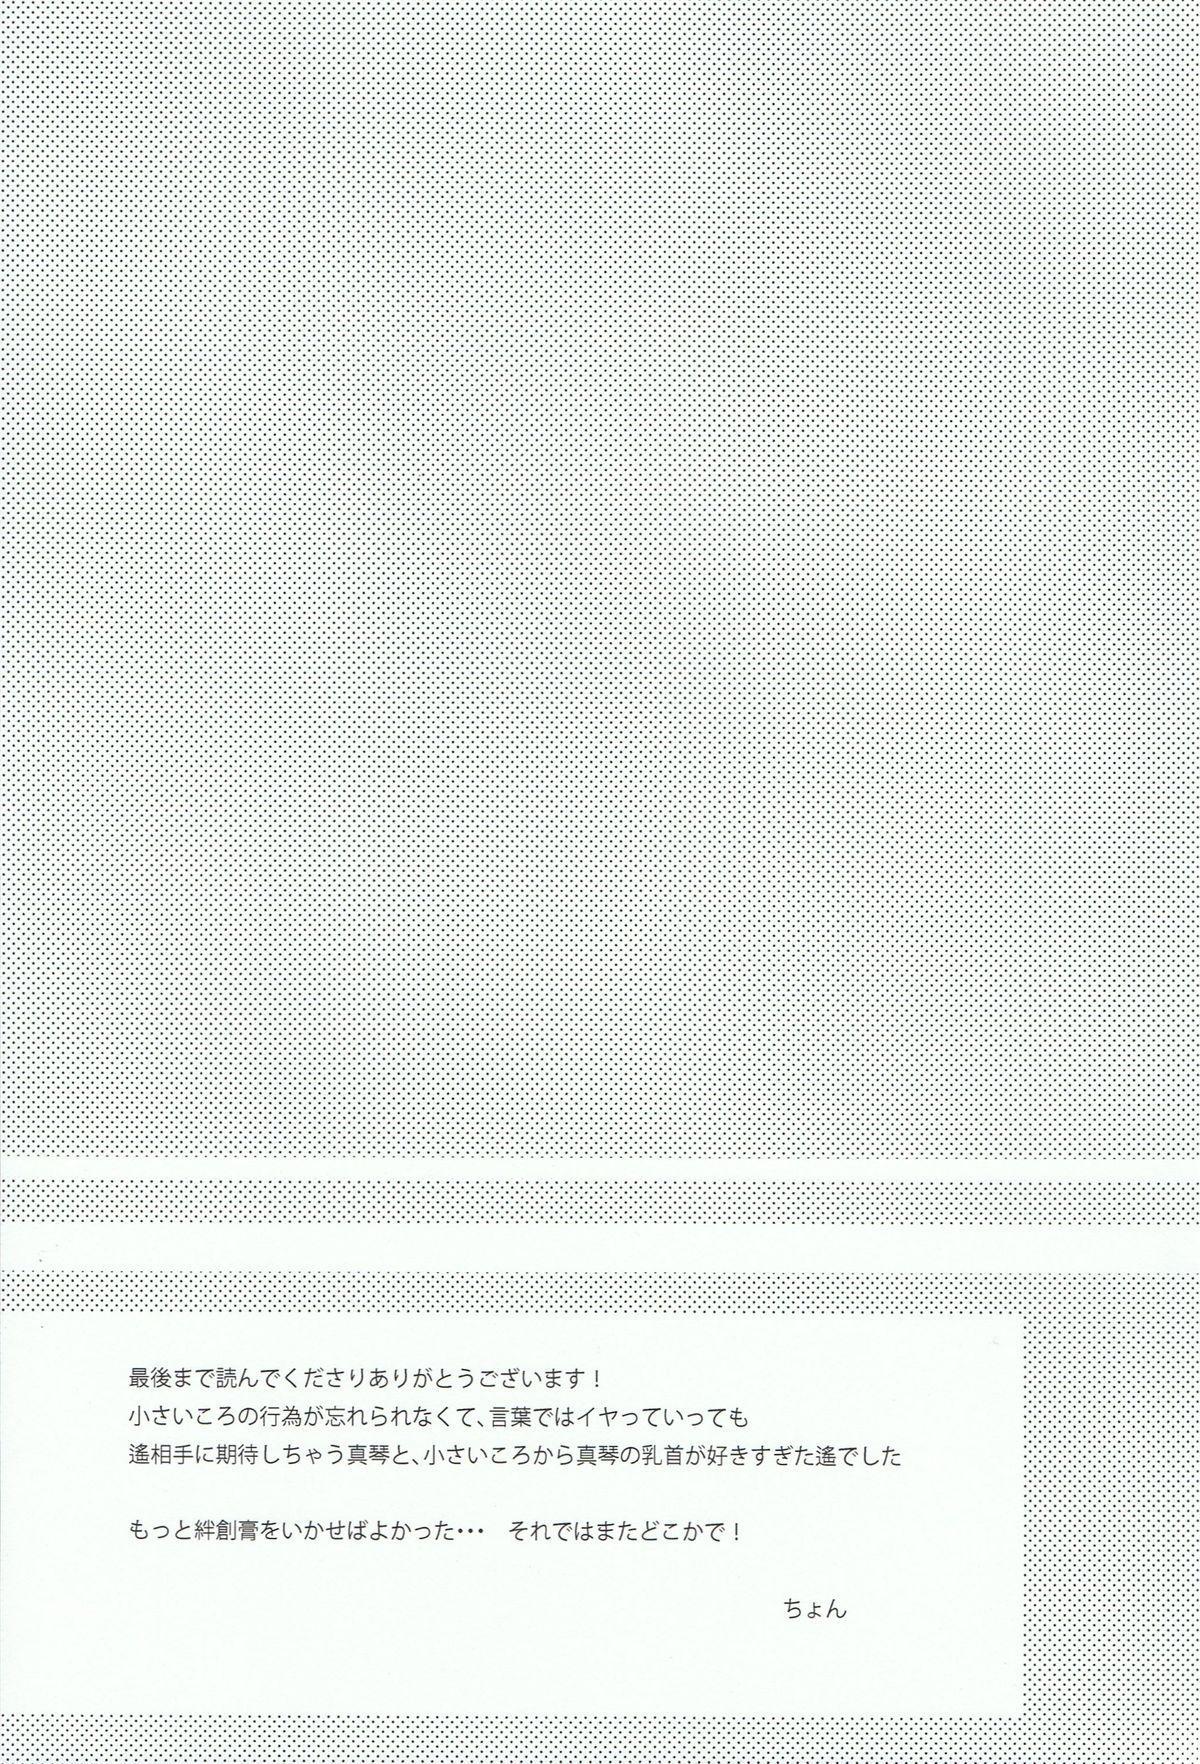 Tachibana Makoto ha Bansoukou ga Tebanasenai 26